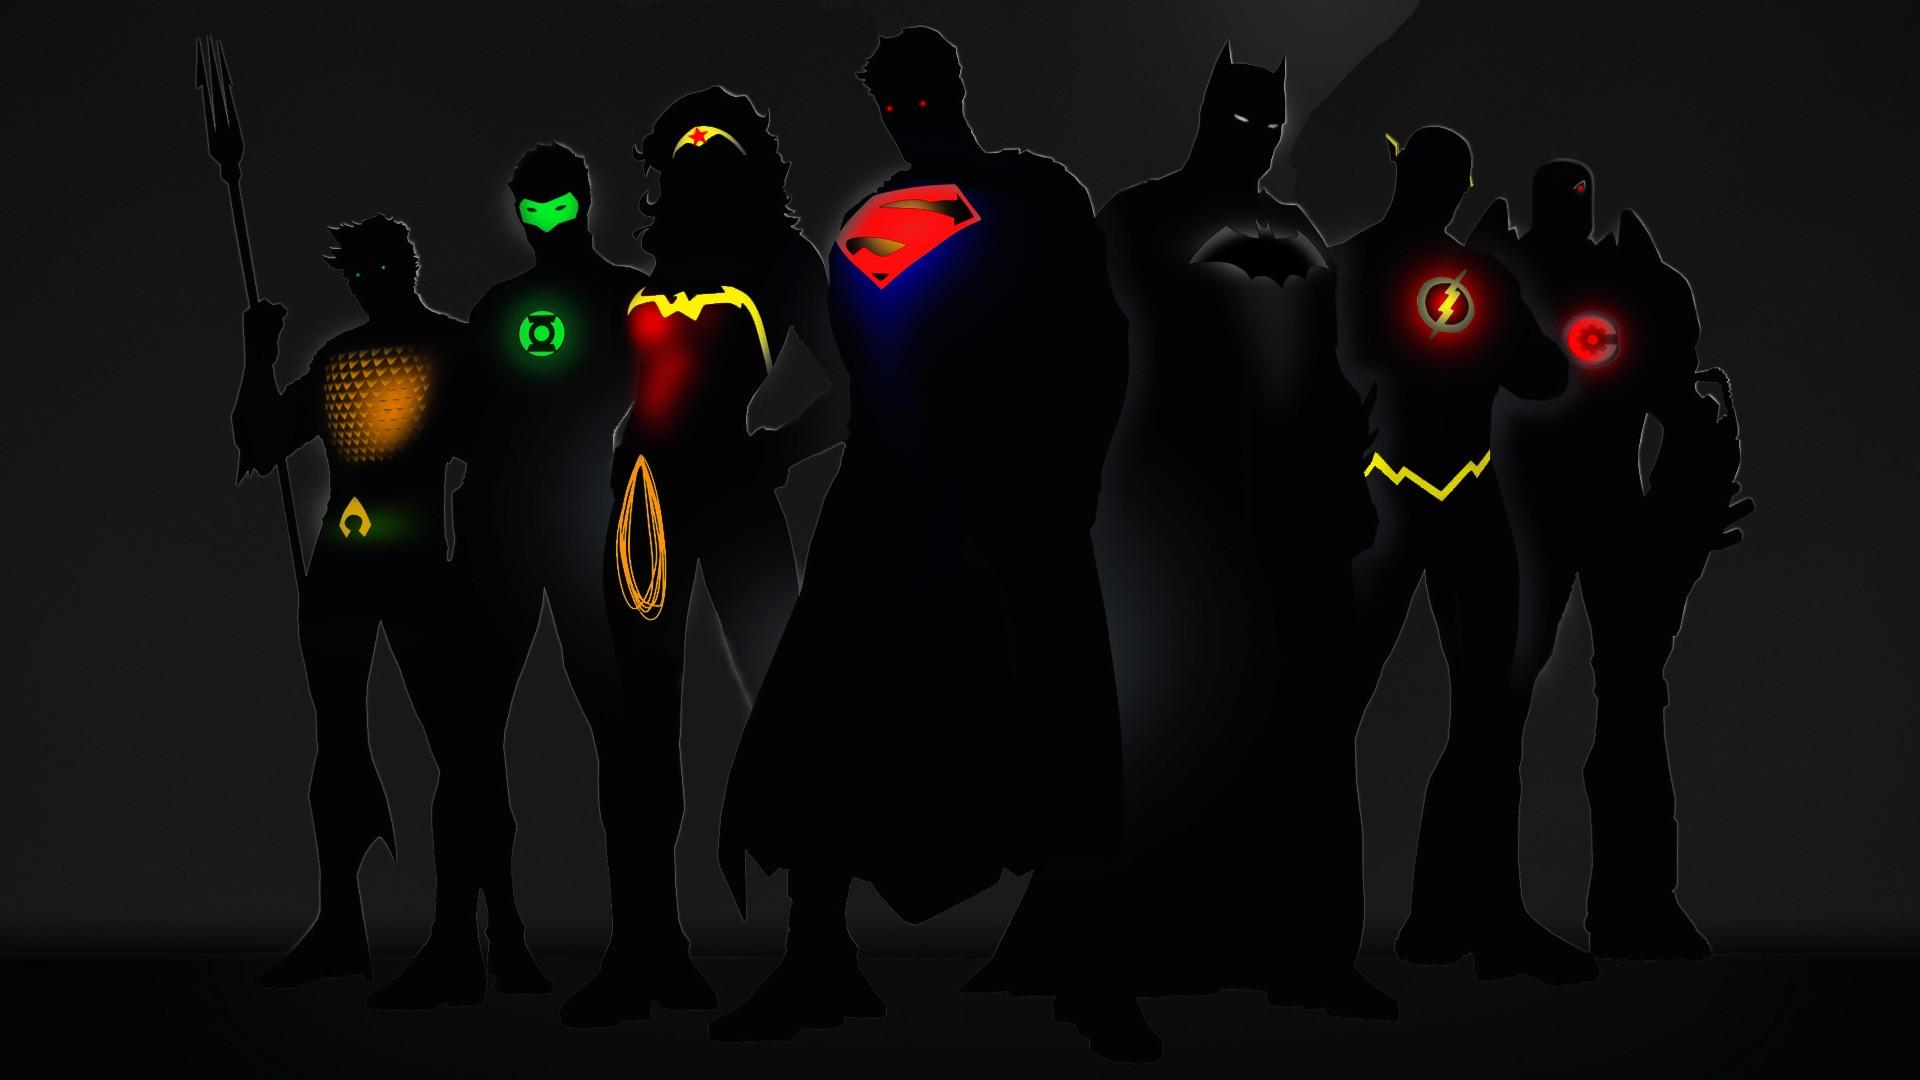 داونلود کارتون جدید لیگ عدالت Justice League